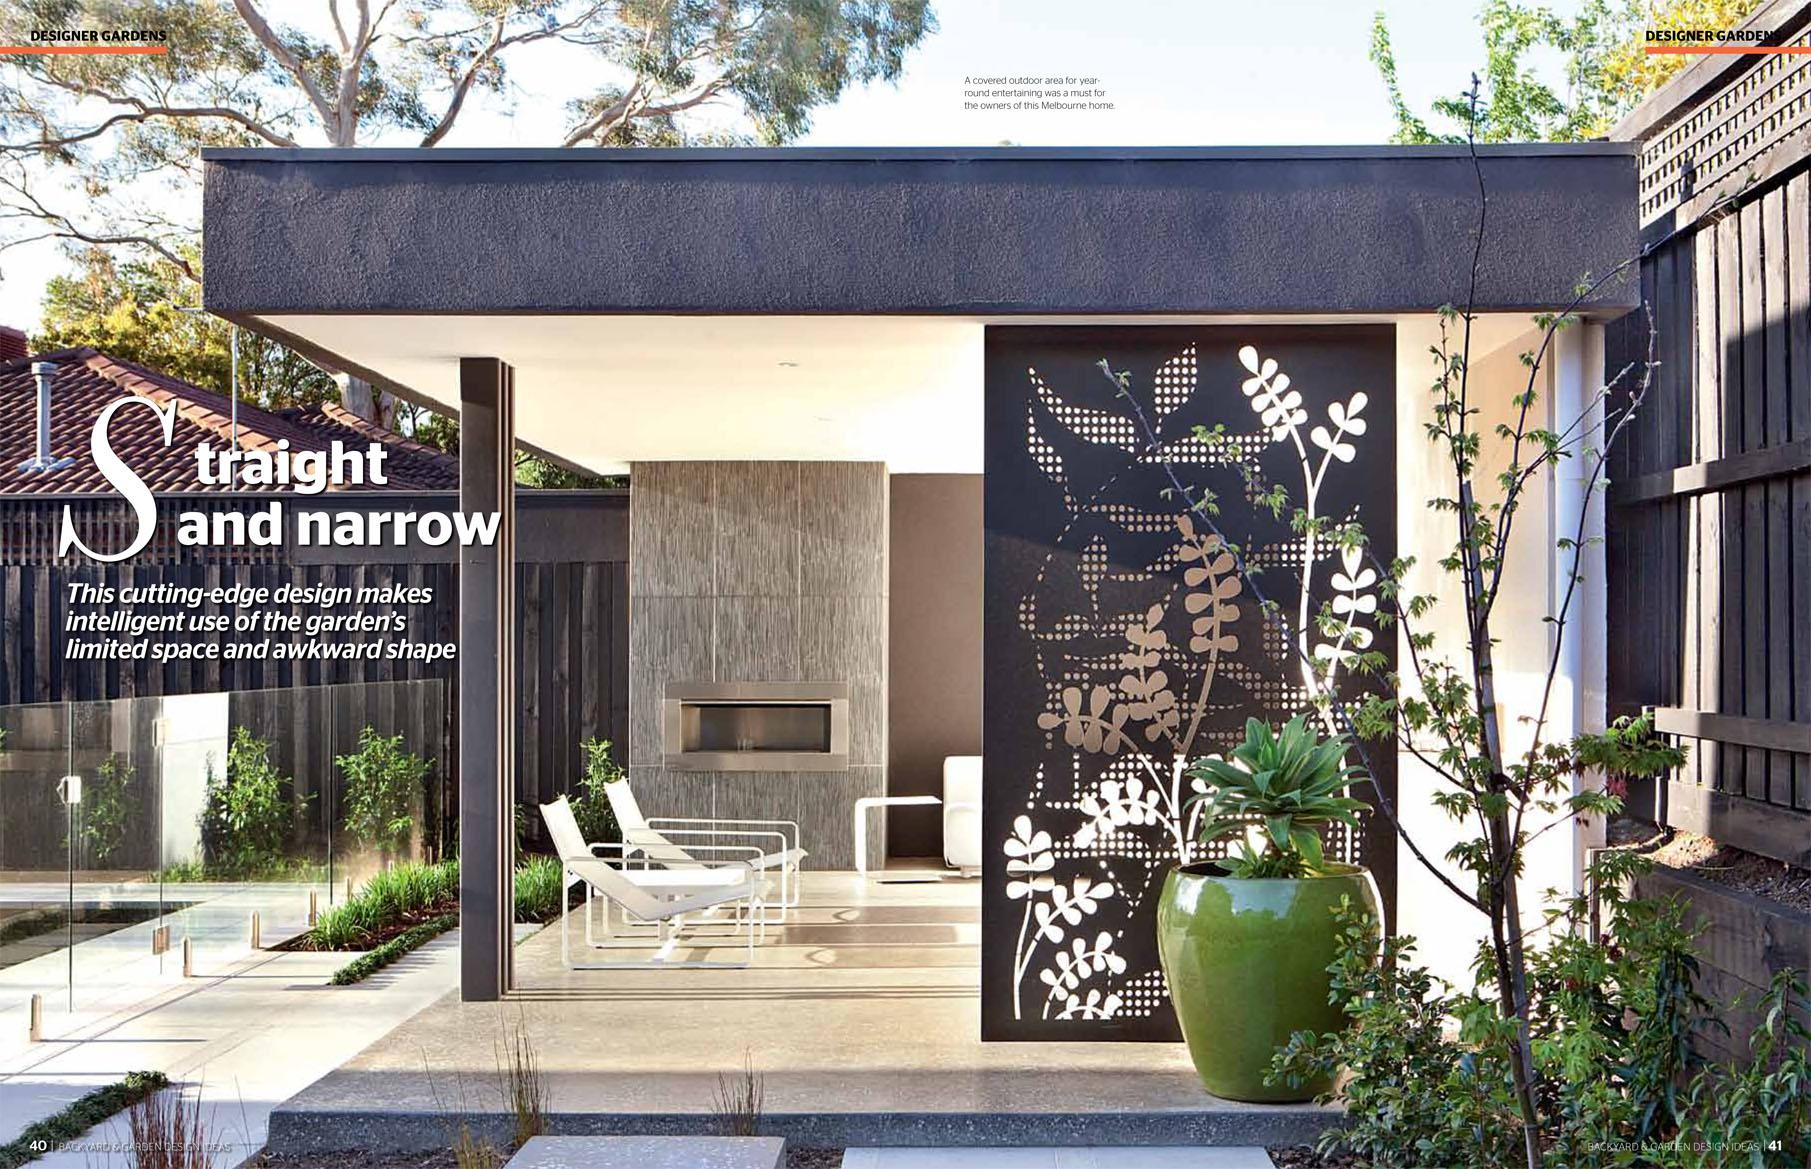 Ian barker gardens featuring in backyard garden design ideas for Patio landscape plans